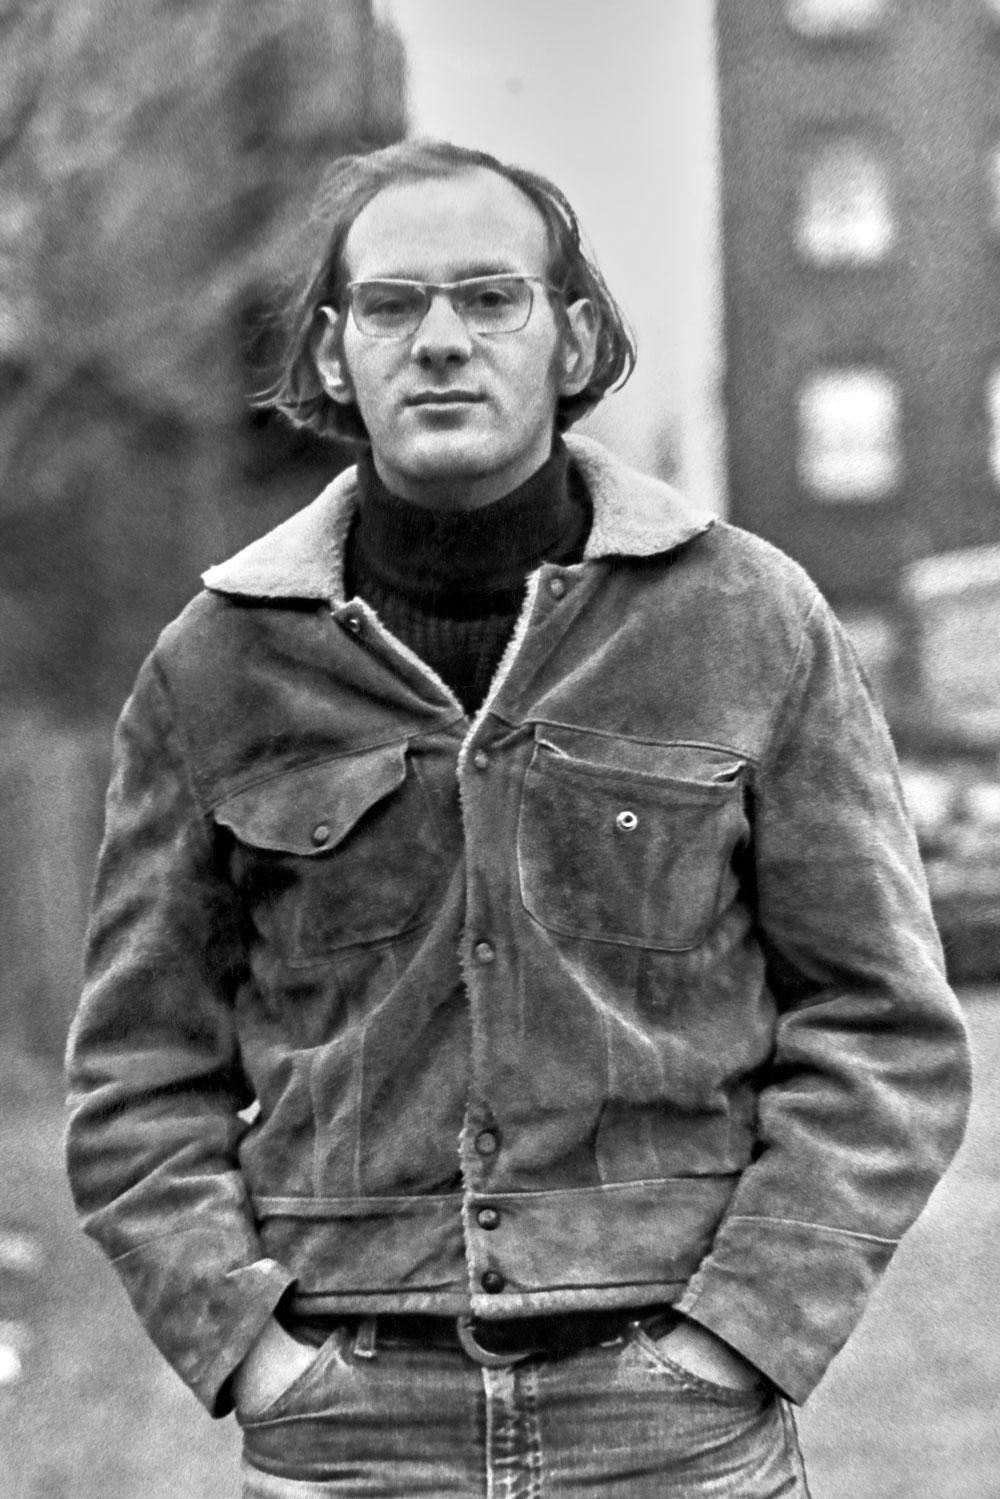 David Kaufman, 1968, Montreal